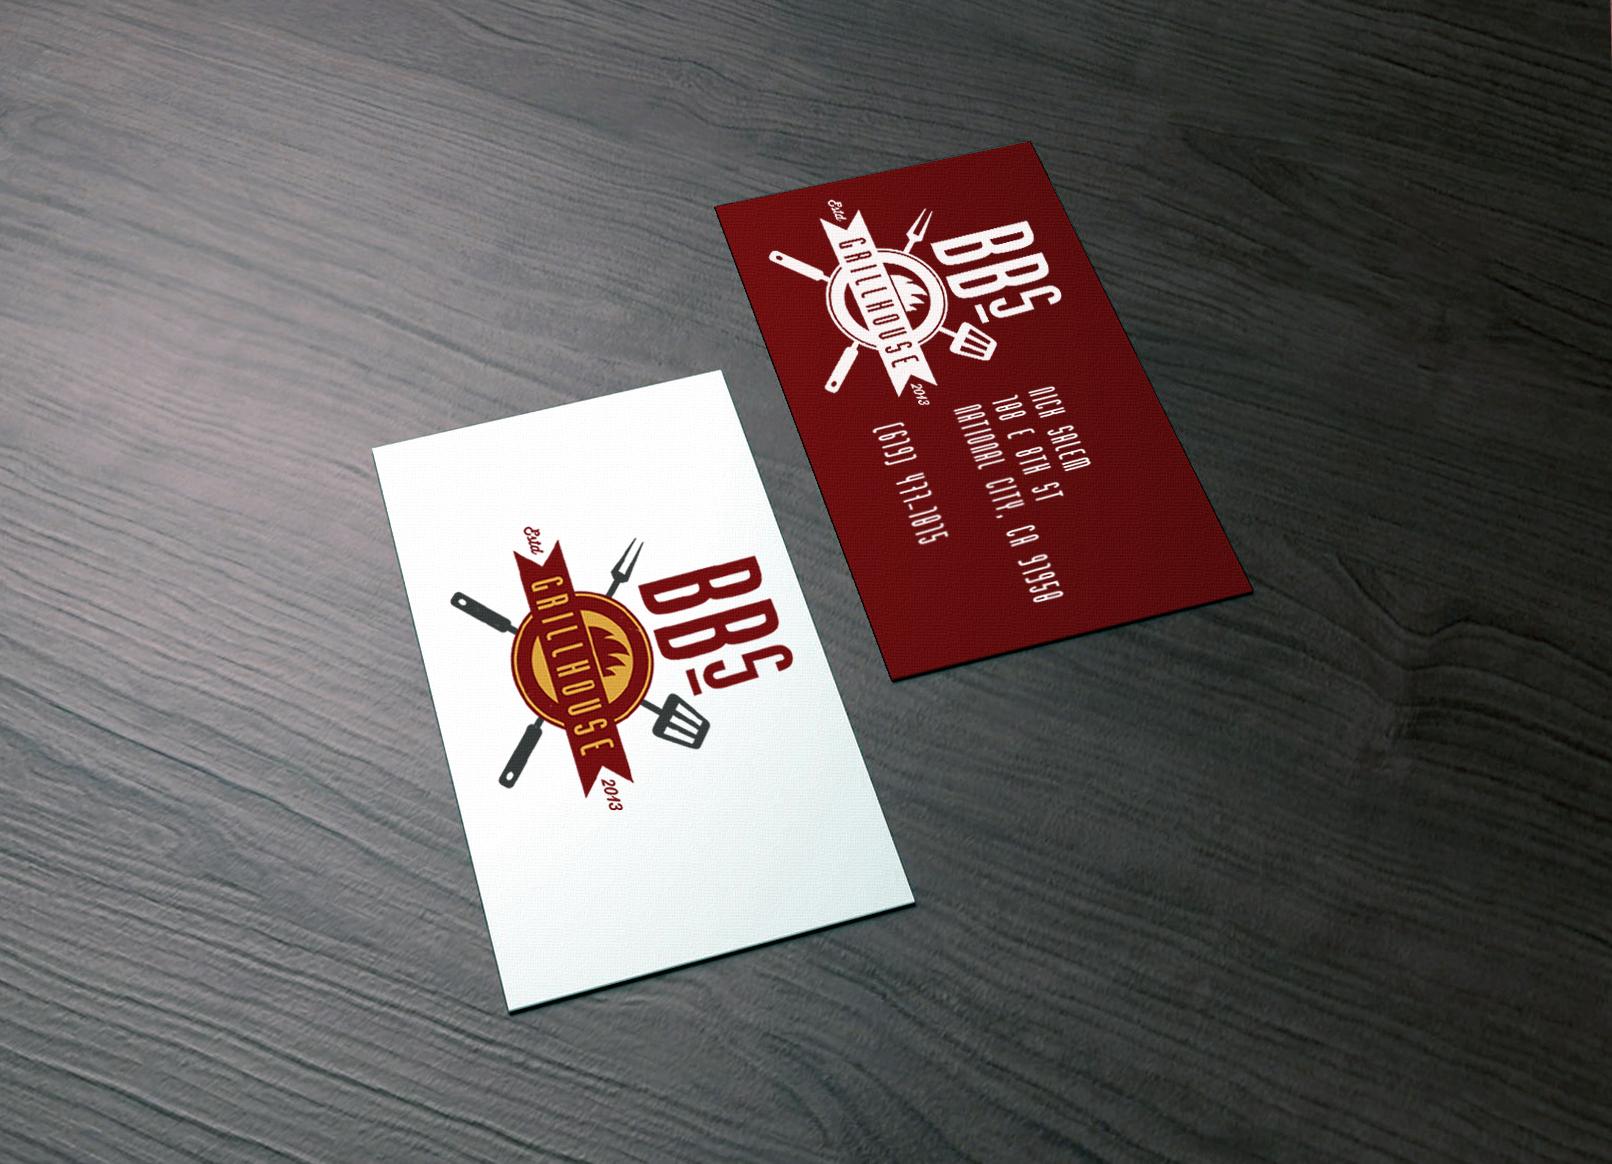 bb's_cards-1.jpg